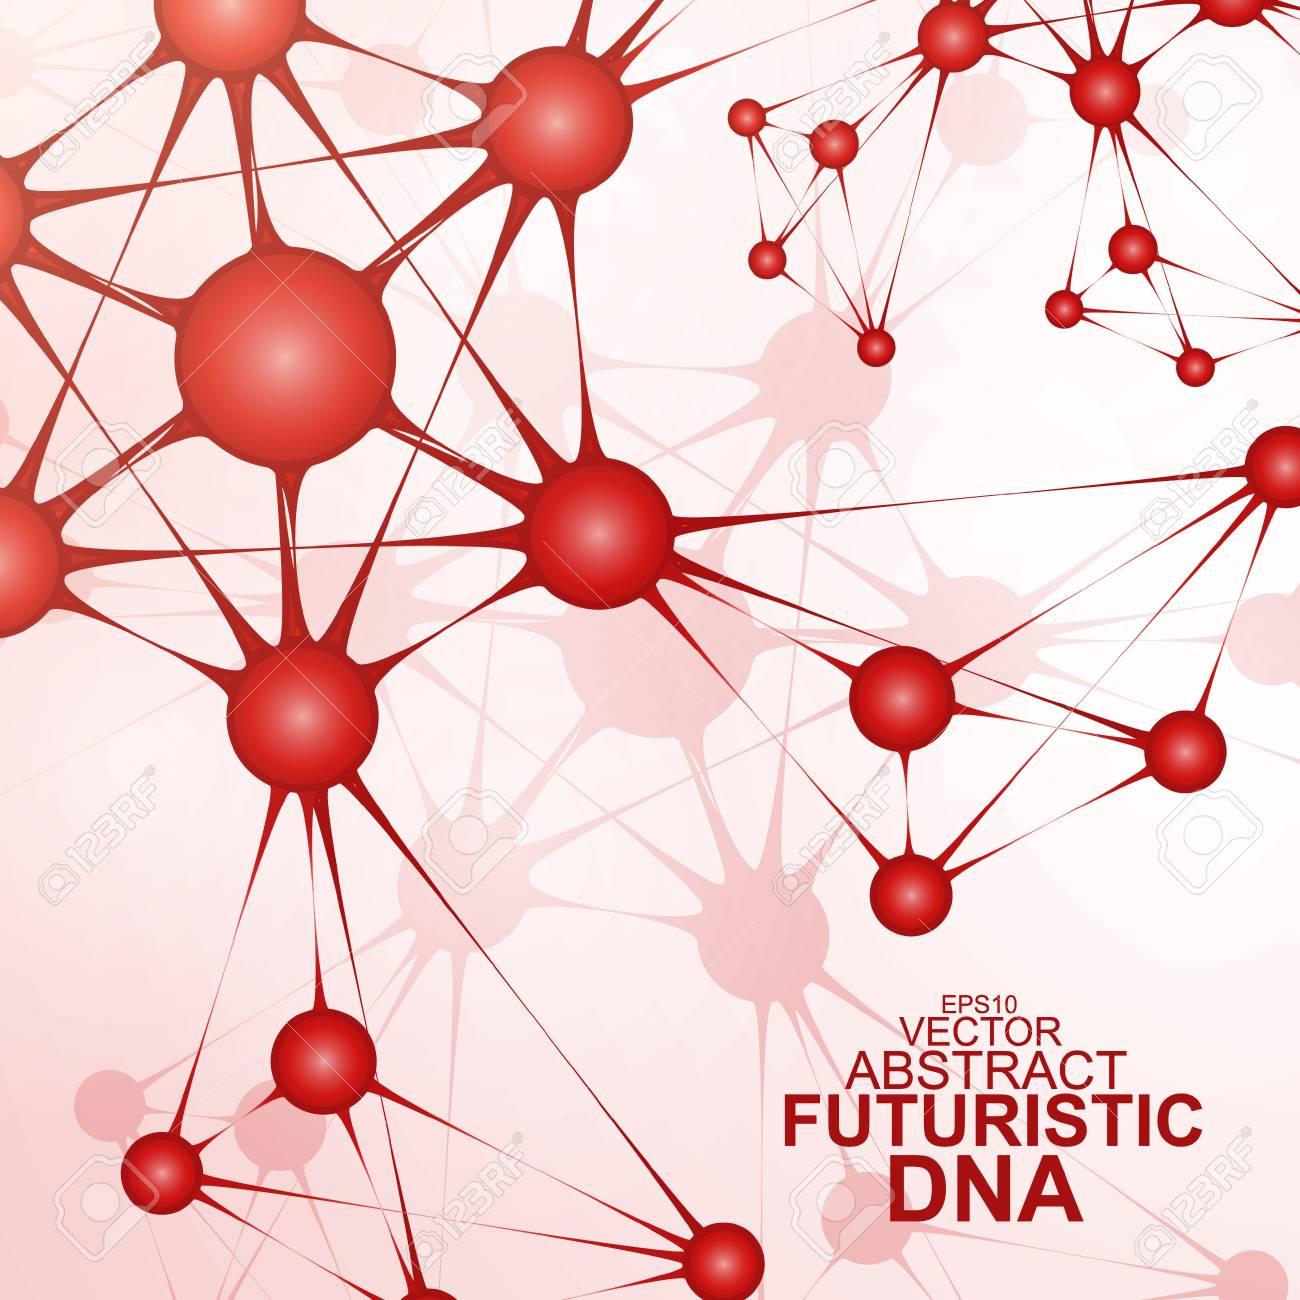 Futuristic dna, abstract molecule, cell illustration Stock Vector - 19354918